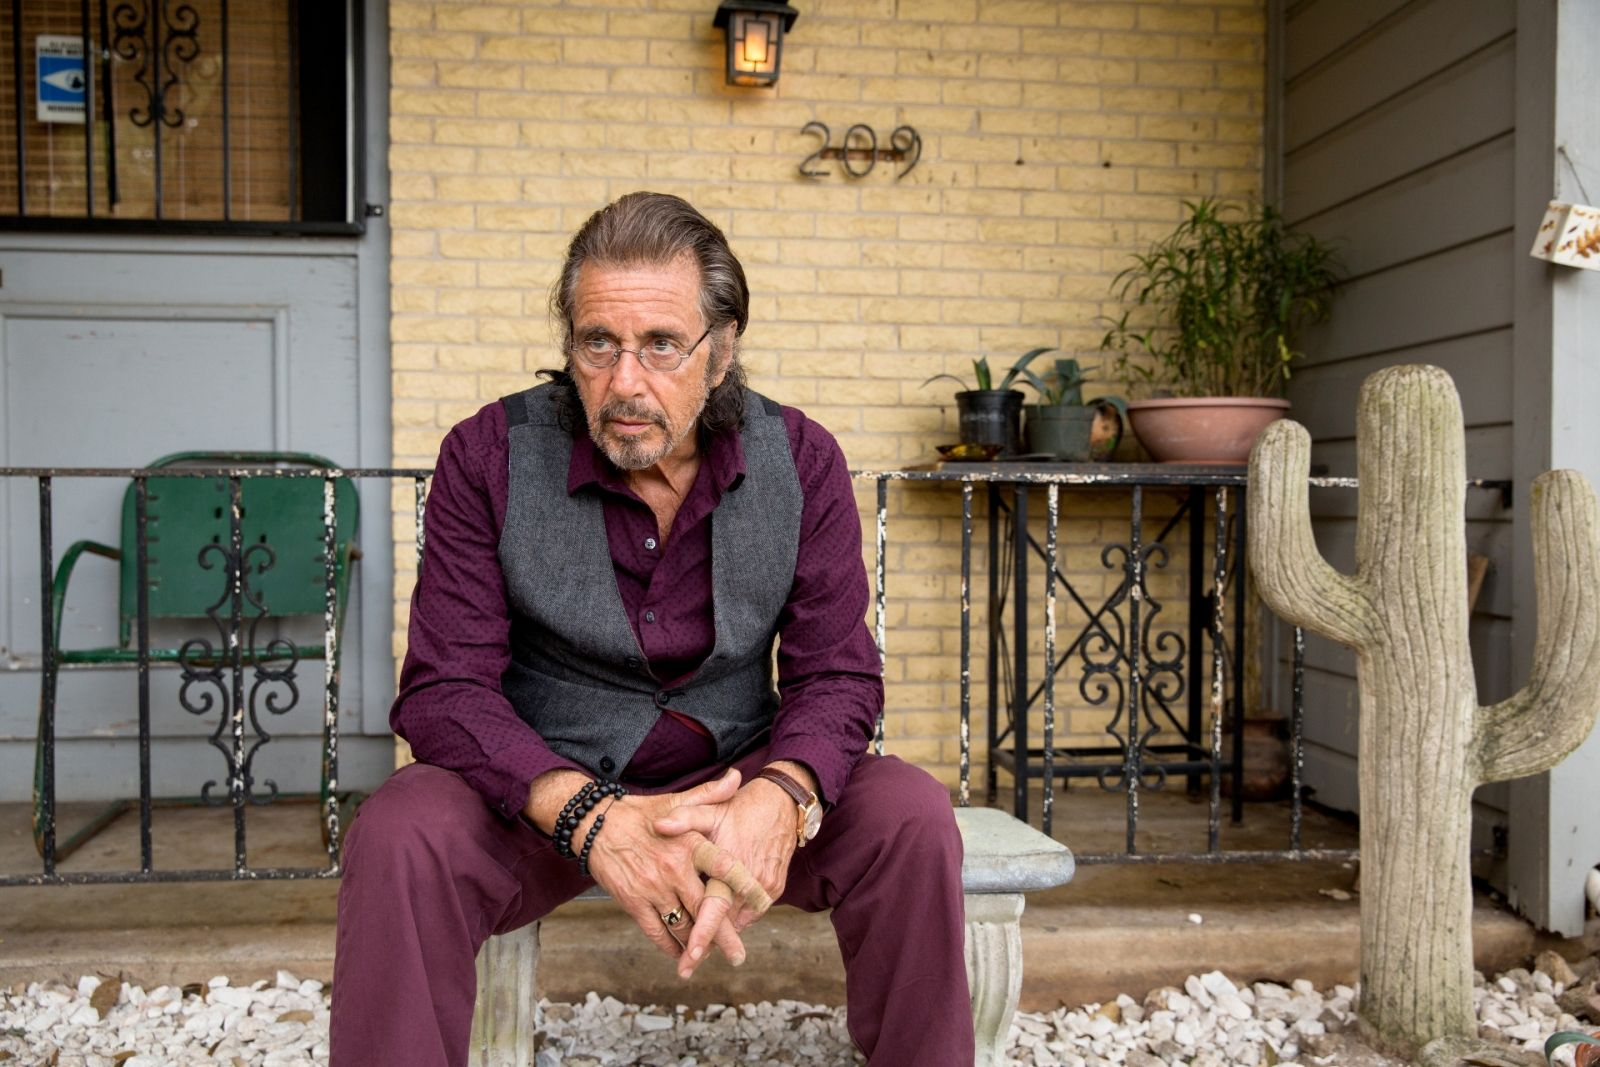 Pacino in Manglehorn